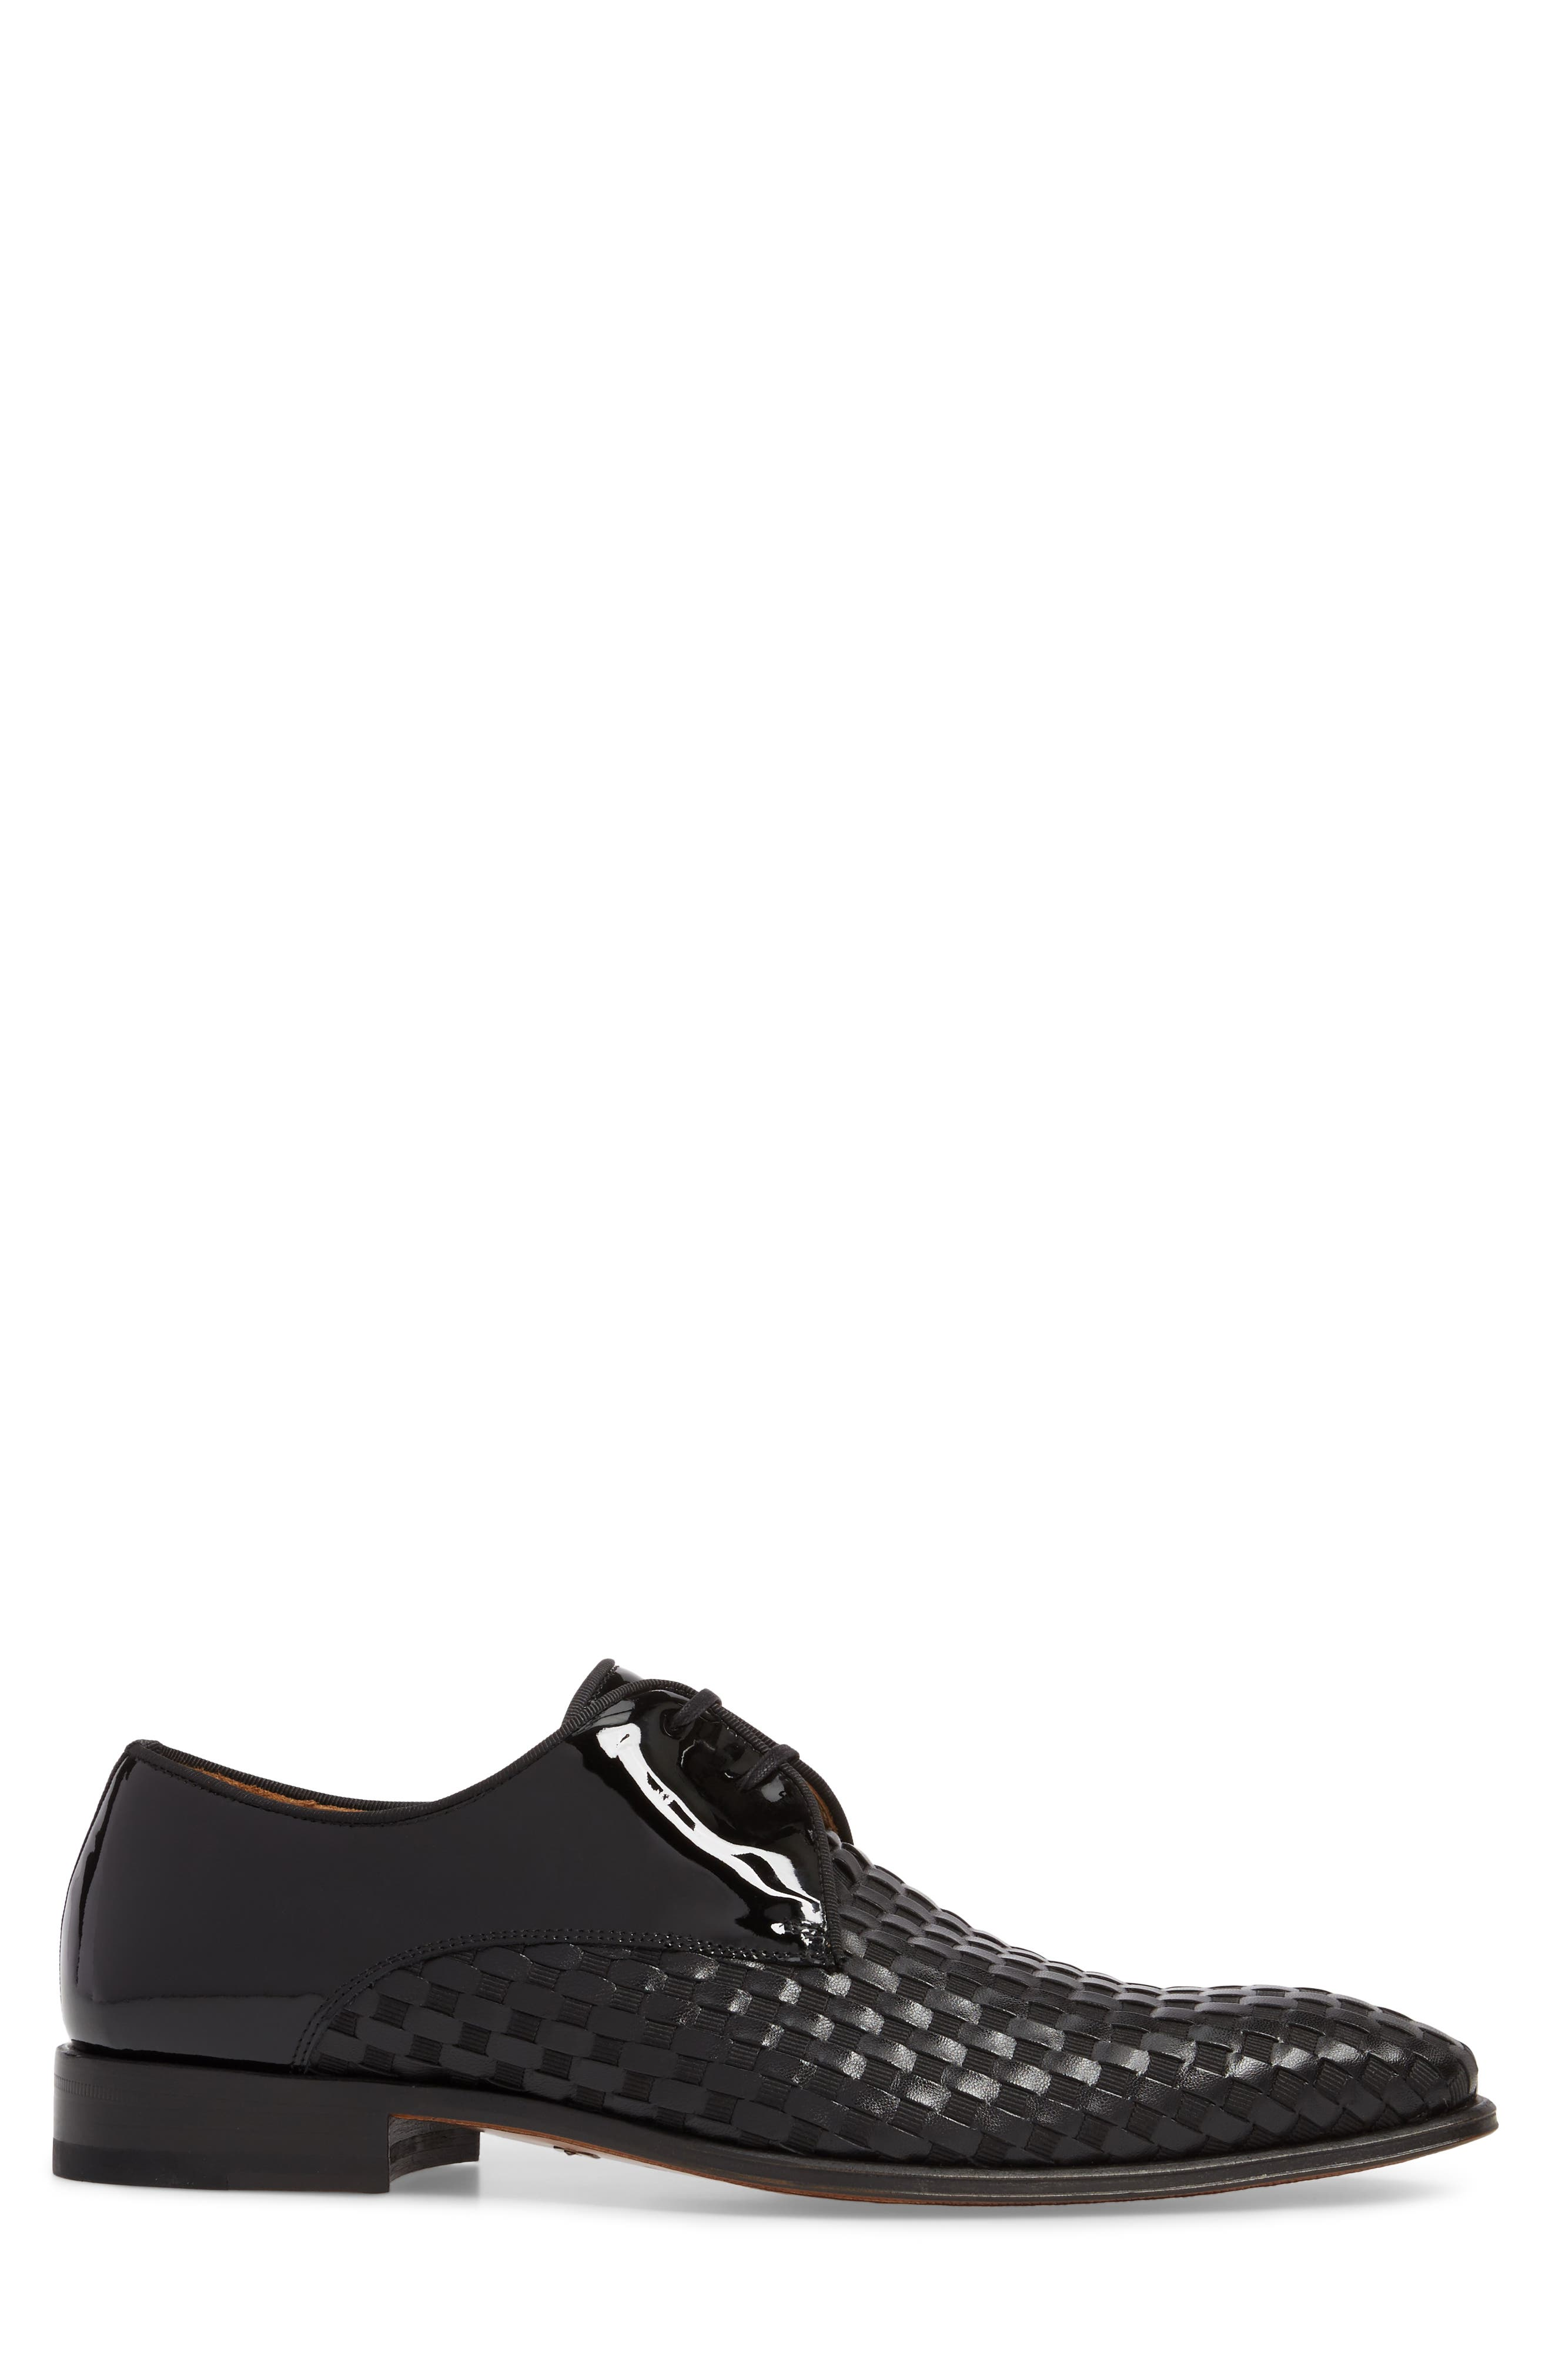 Sexto Plain Toe Derby,                             Alternate thumbnail 3, color,                             Black Leather